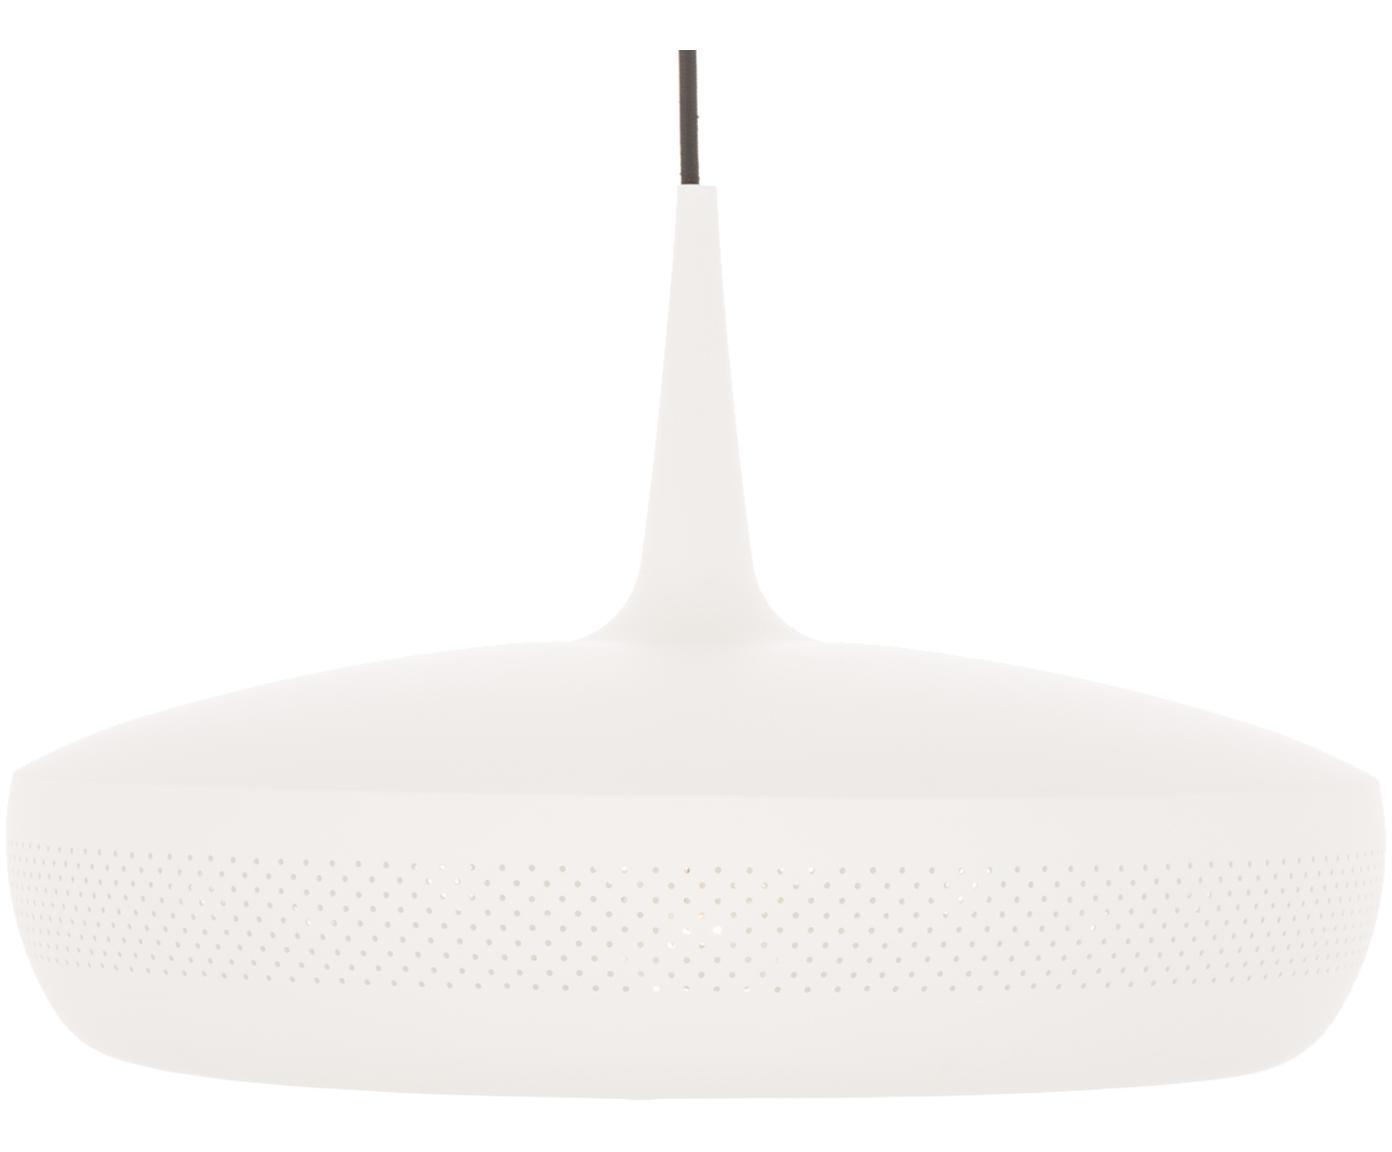 Hanglamp Clava Dine in wit, Lampenkap: gecoat aluminium, Mat wit, Ø 43 x H 28 cm